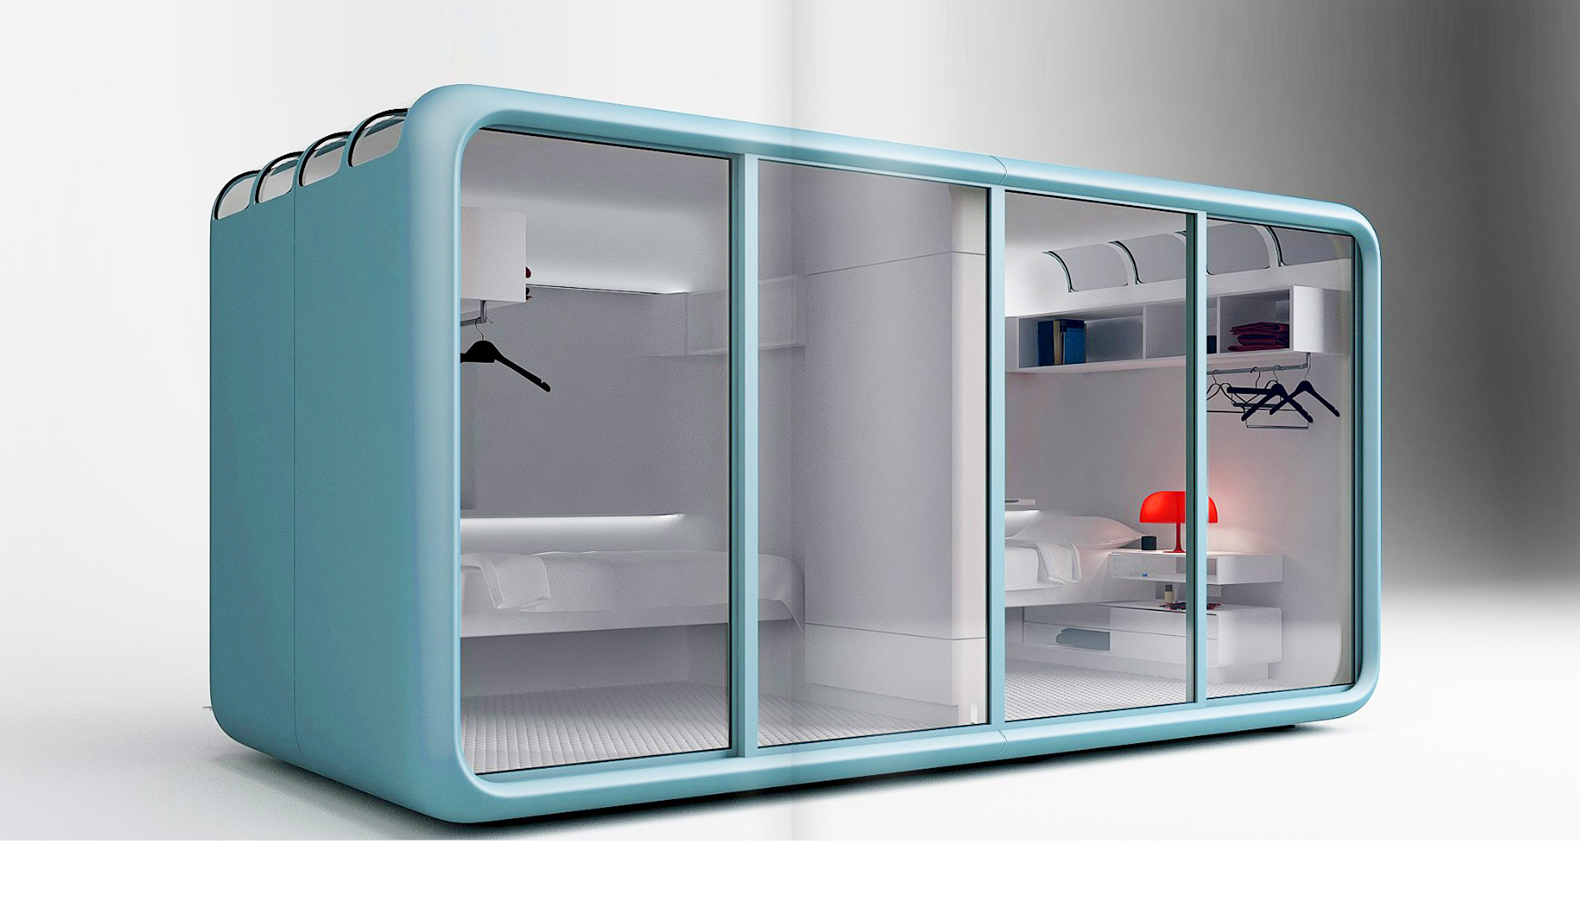 The-Sleeping-Pod-CannonDesign-Yazdani-Studio-Utah-University-Pod-1-Humble-Homes1